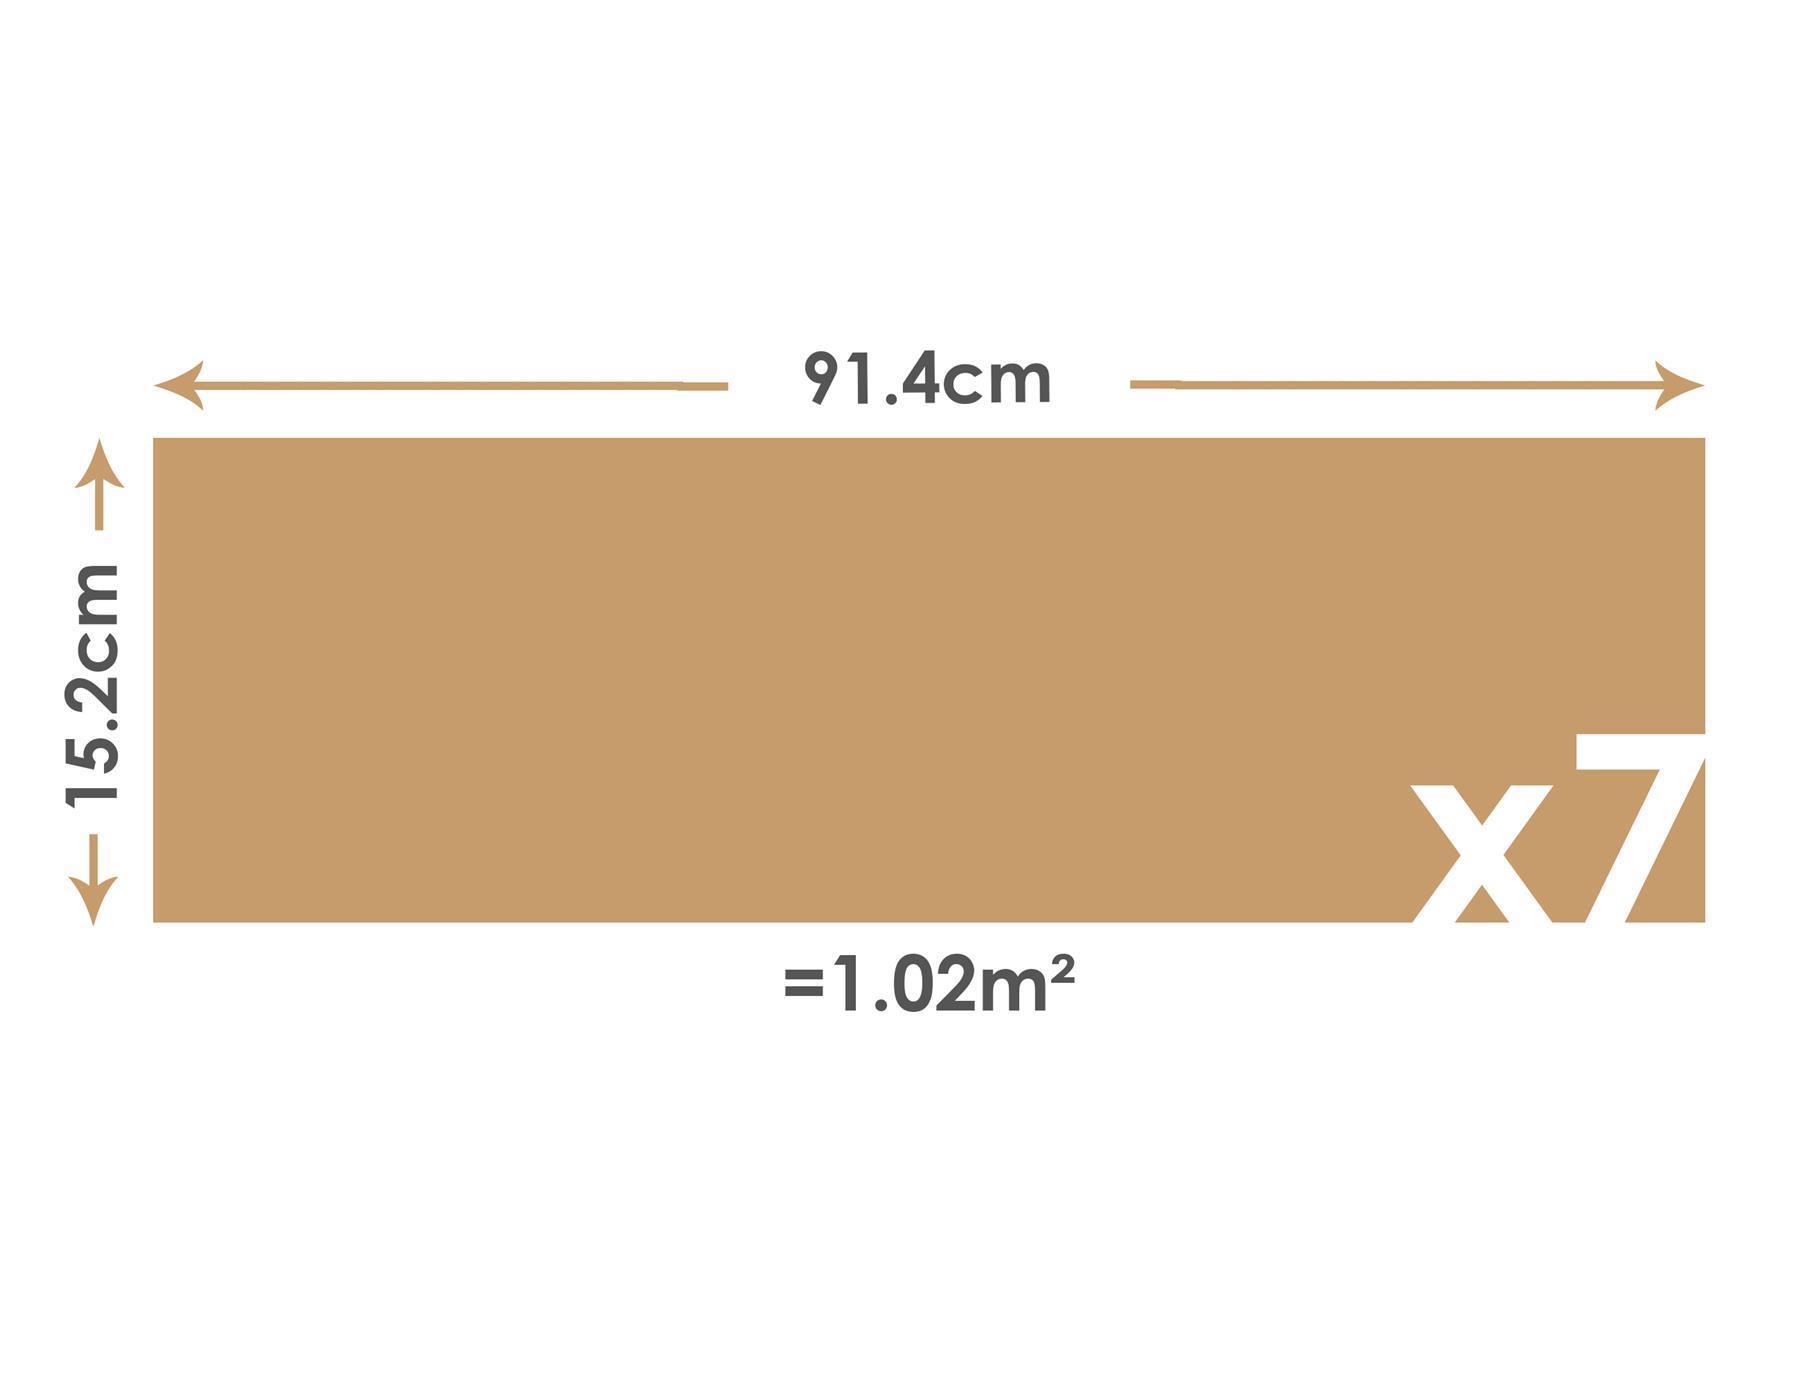 thumbnail 20 - Floor Planks Tiles Self Adhesive Vinyl Brown Wood Flooring Kitchen Bathroom